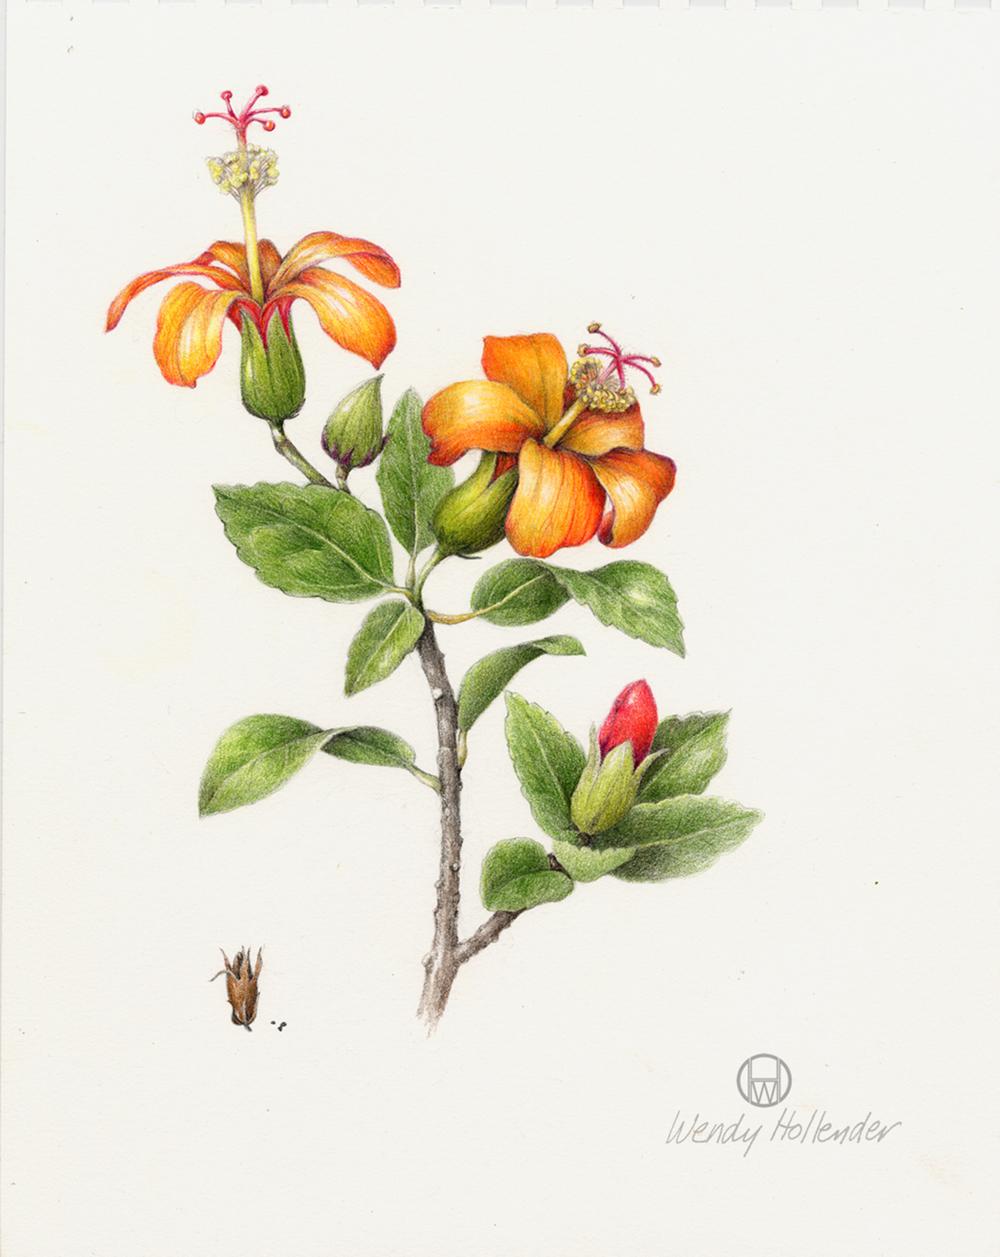 Hibiscus Kokio - Hibiscus kokio